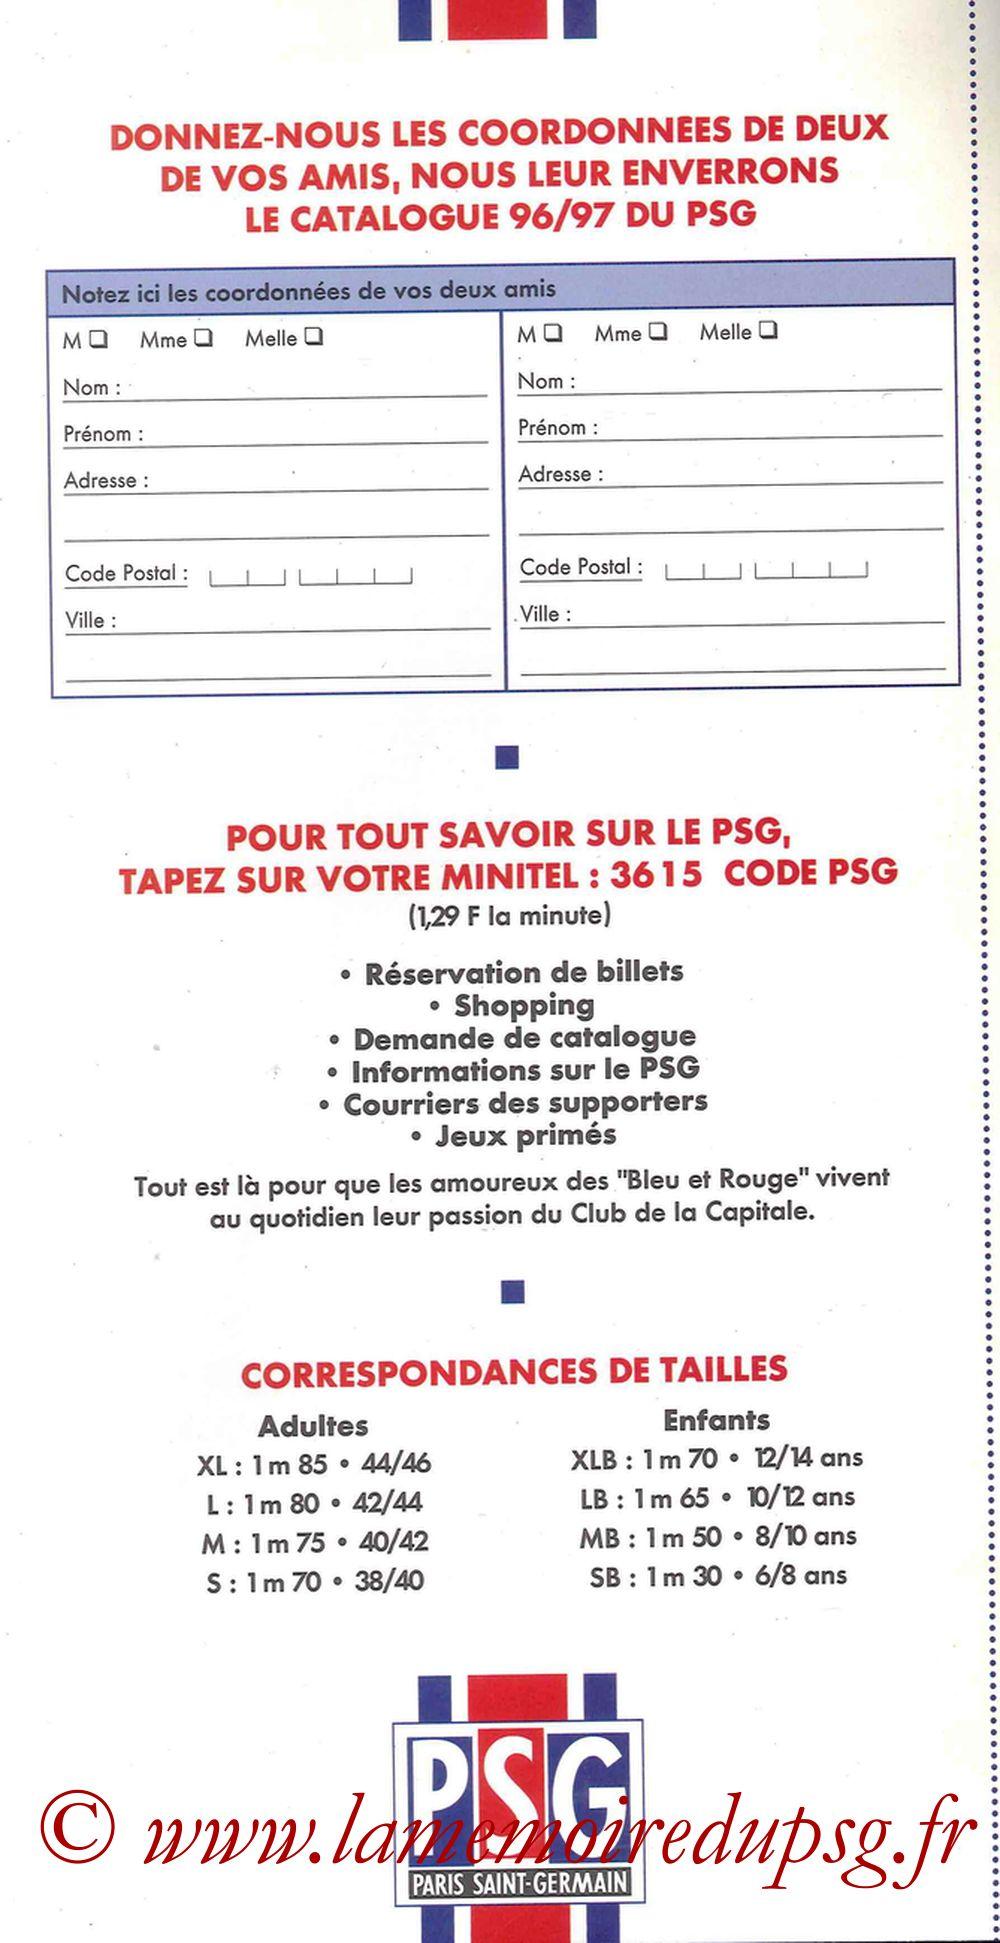 Catalogue PSG - 1996-97 - Bon de commande 2